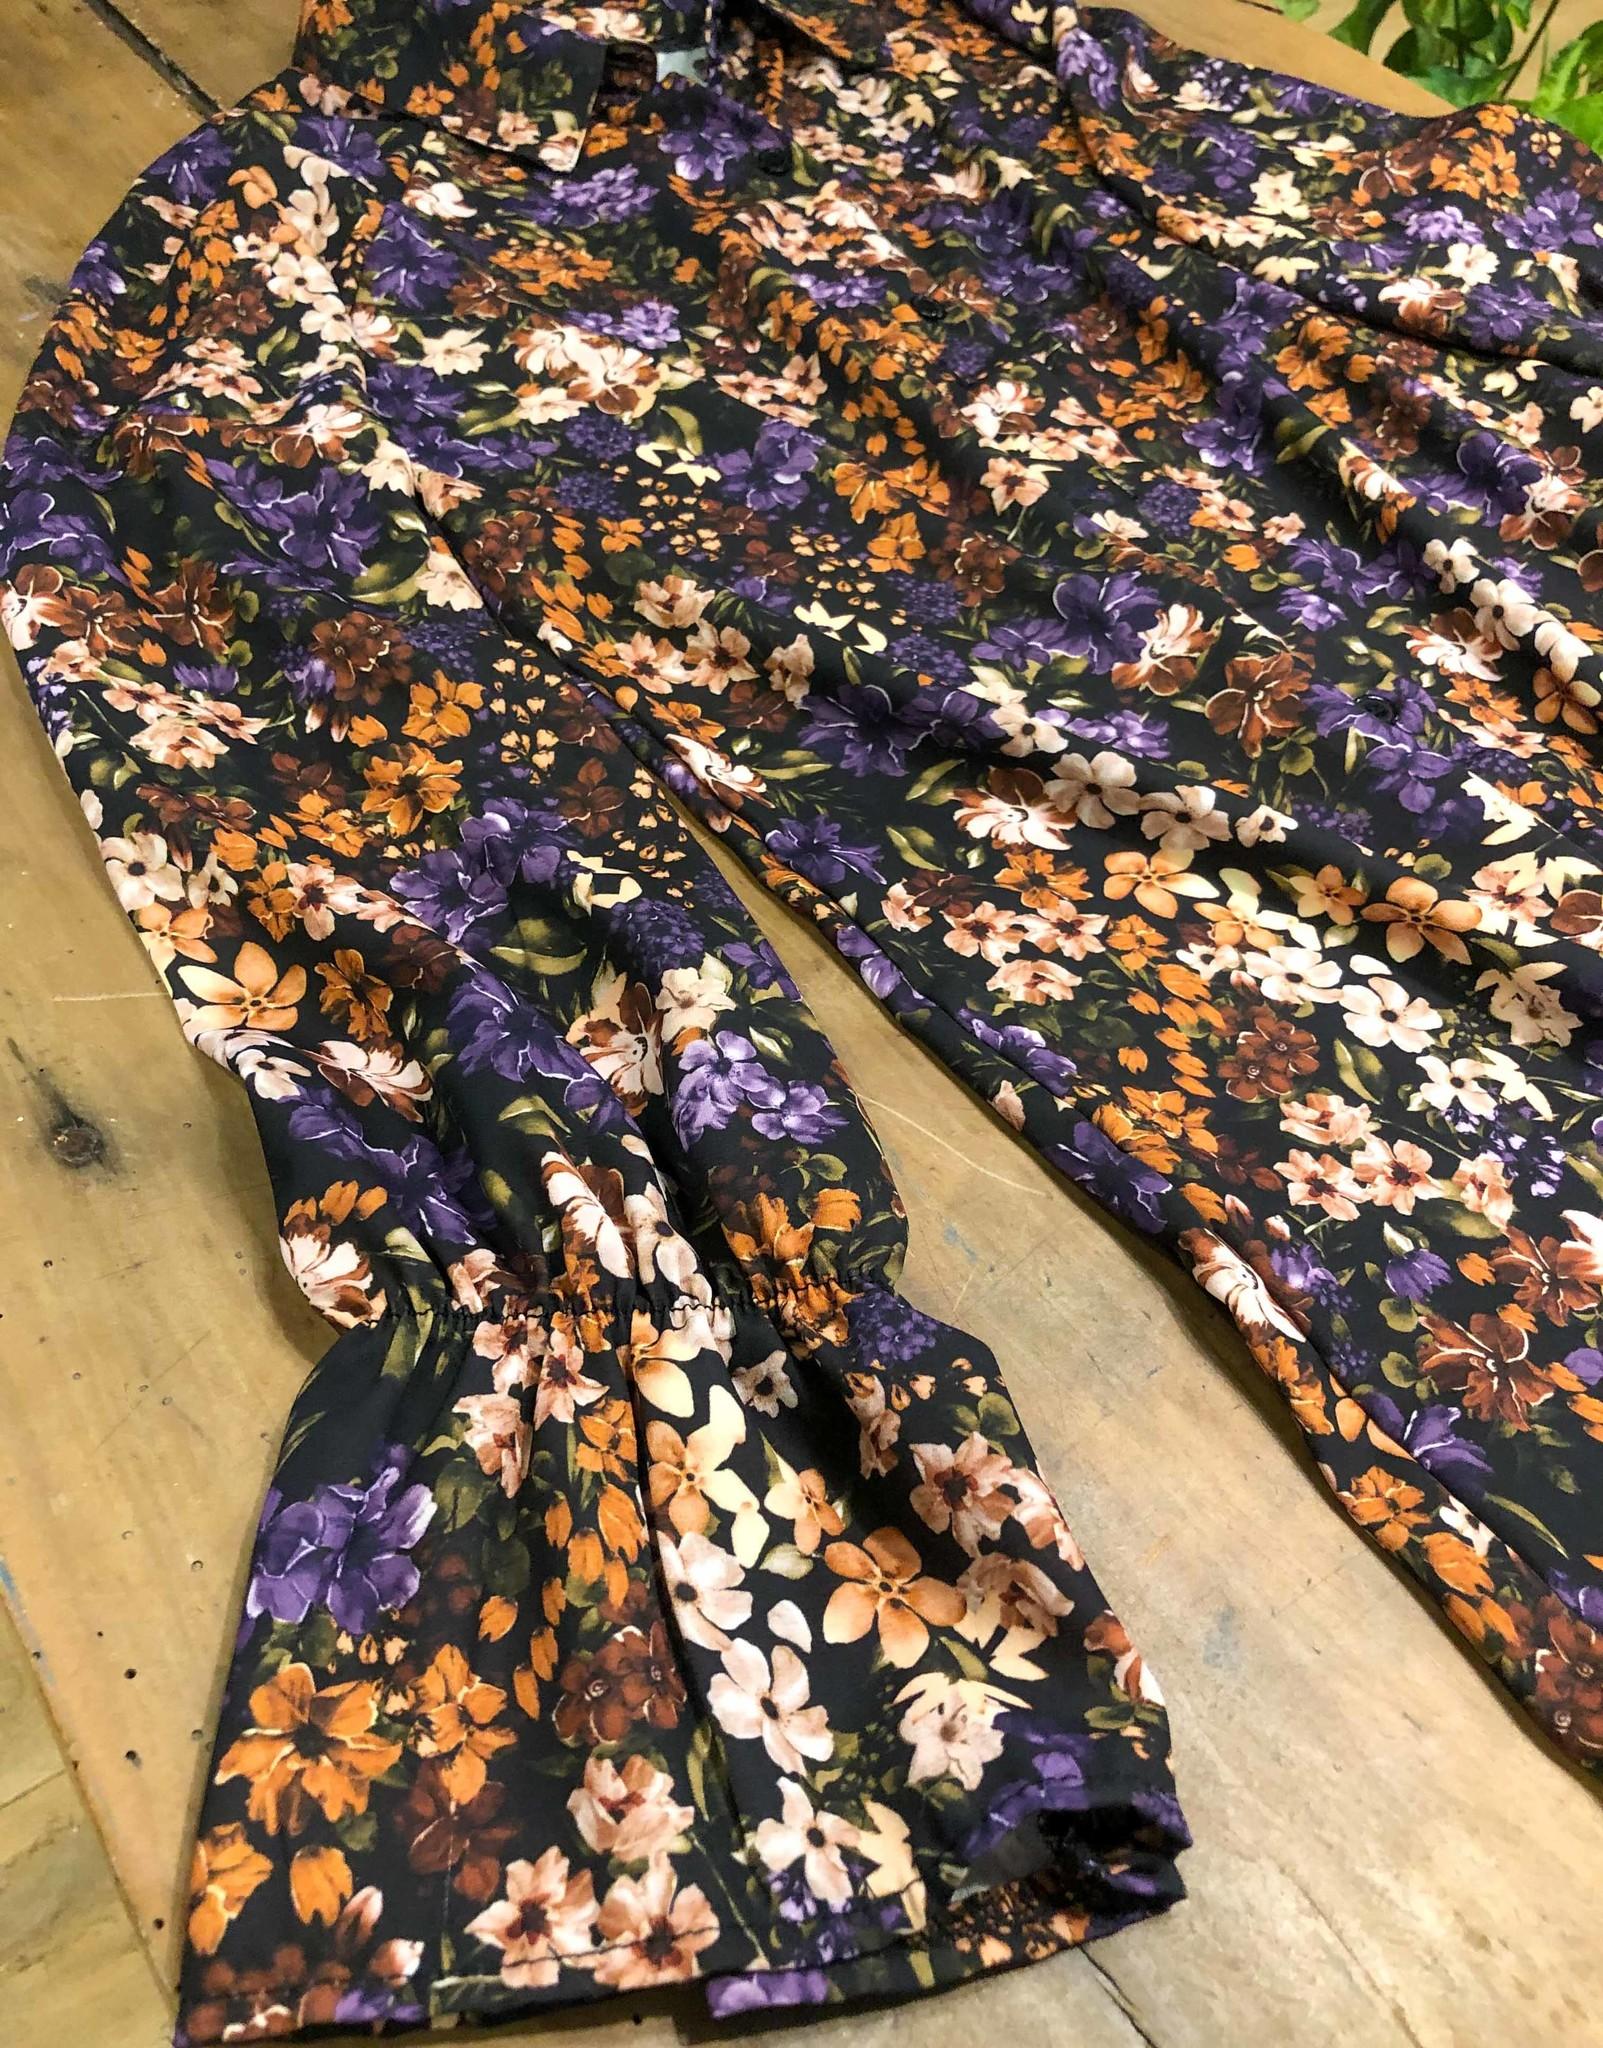 Blouse Acadia bloemen